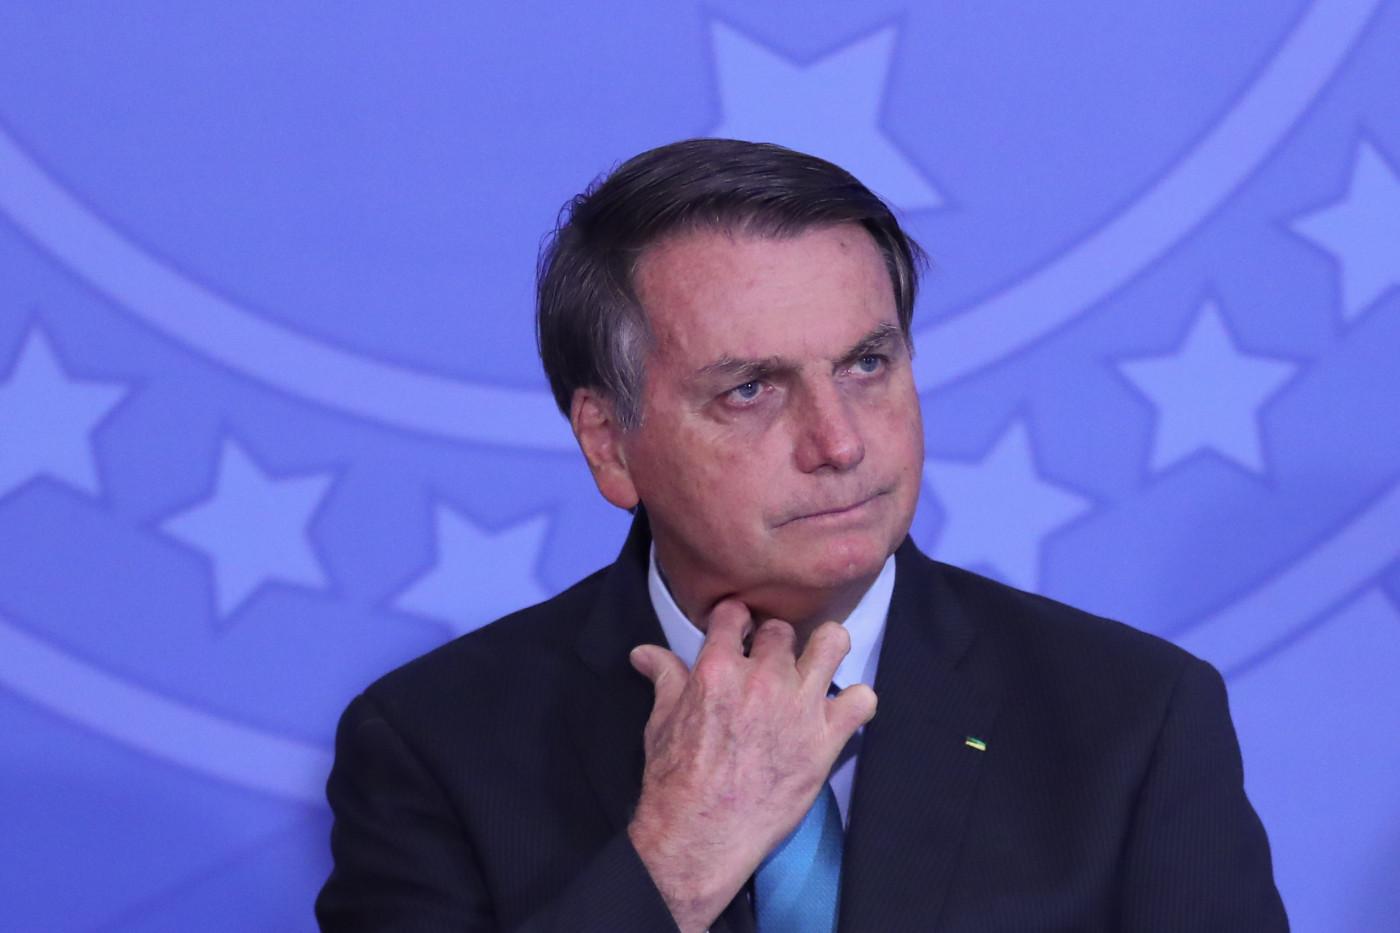 Exclusivo: Bolsonaro diz que não tomará vacina chinesa | Jovem Pan